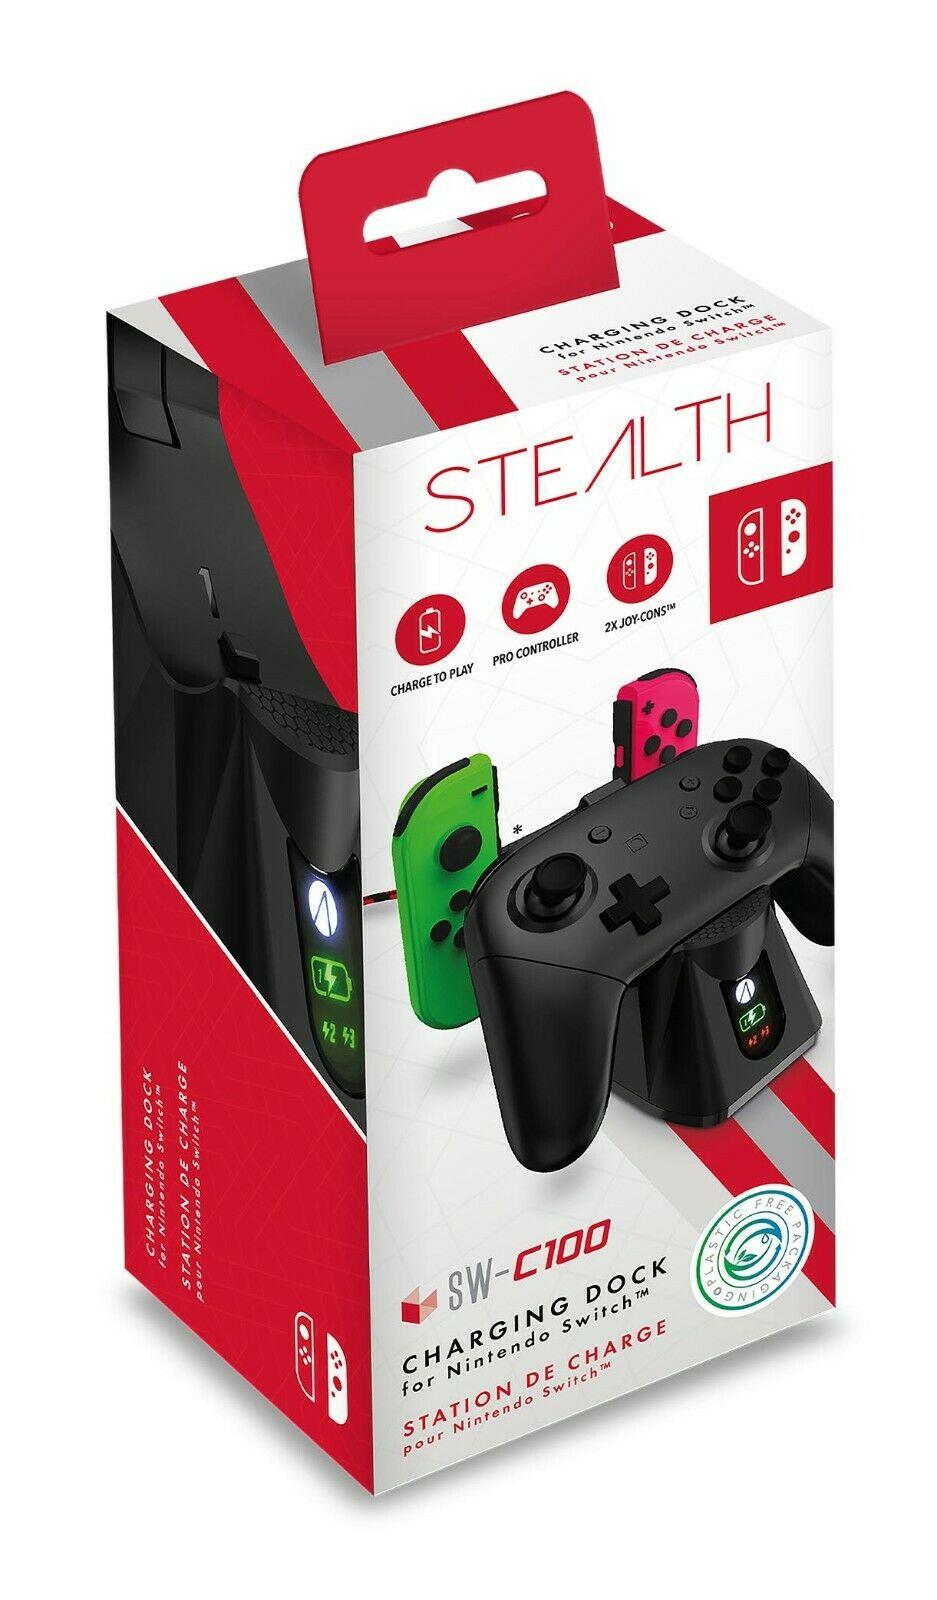 Nintendo Switch stealth docking station £1 @ Asda Oadby (Leicester/ Sunderland)